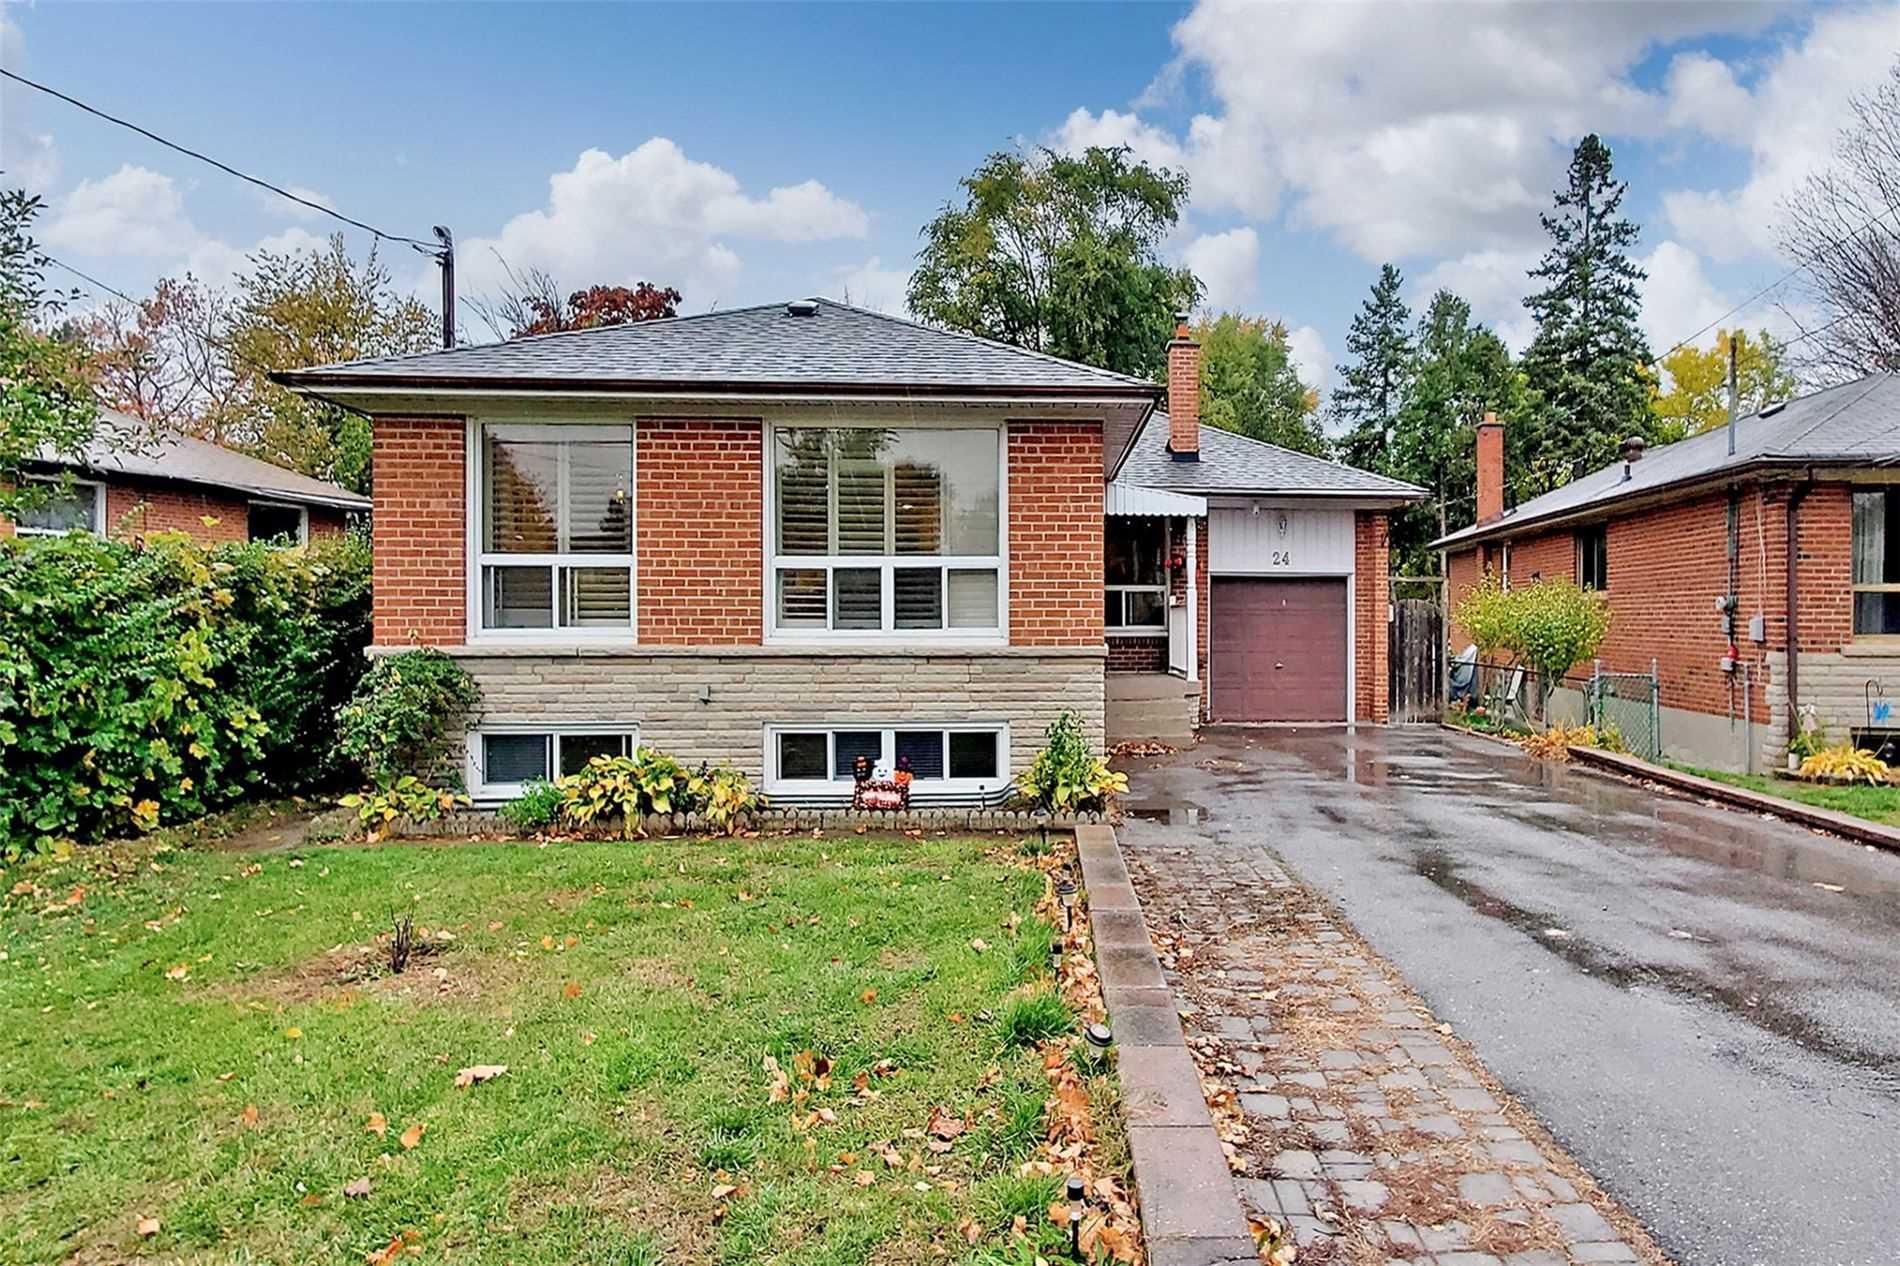 24 Barkwin Dr, Toronto, Ontario M9V 2W3, 3 Bedrooms Bedrooms, 7 Rooms Rooms,2 BathroomsBathrooms,Detached,For Sale,Barkwin,W5131204